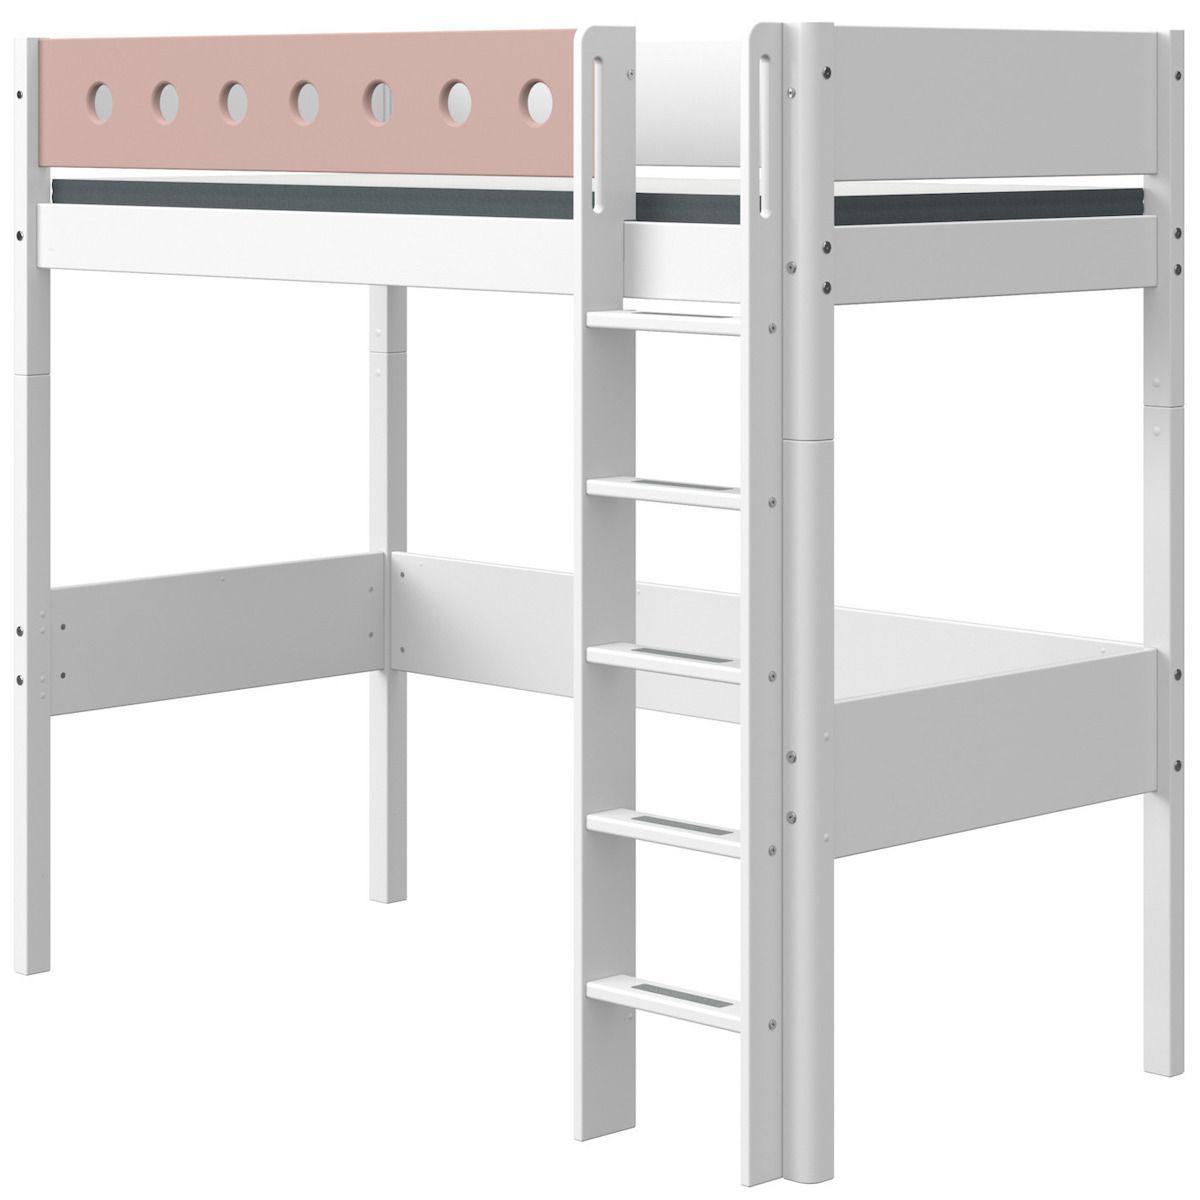 Cama alta 90x200cm escalera recta WHITE Flexa blanco-rosa claro